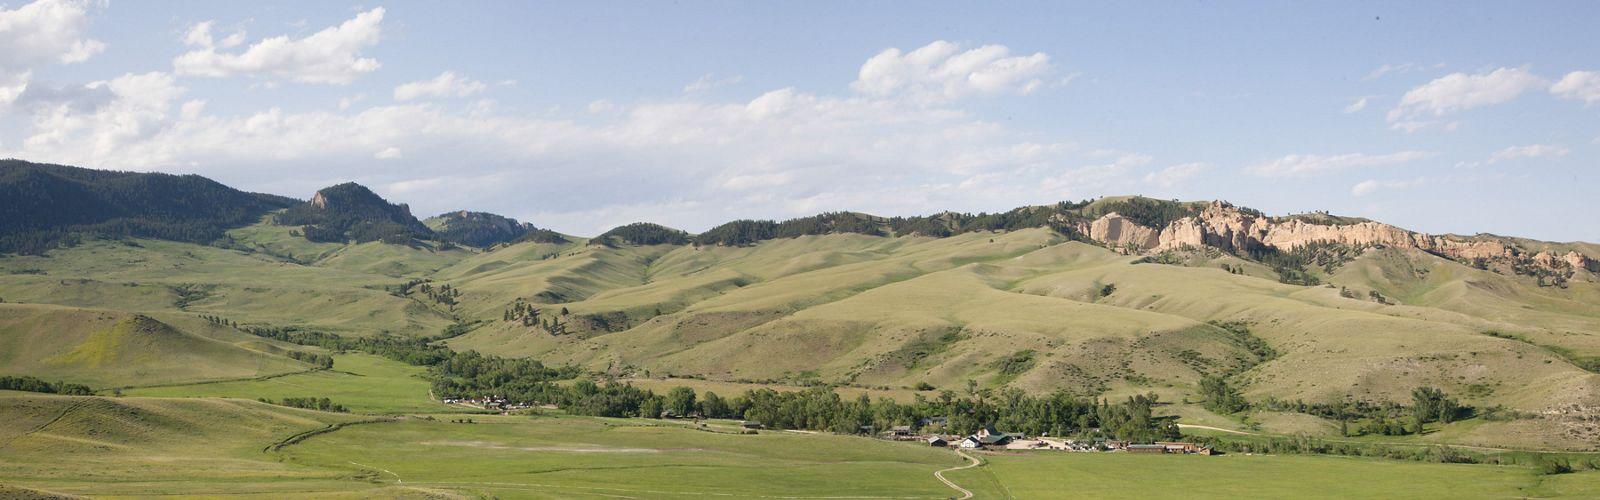 View of HF Bar Ranch. Johnson County, Wyoming. June 17, 2012.